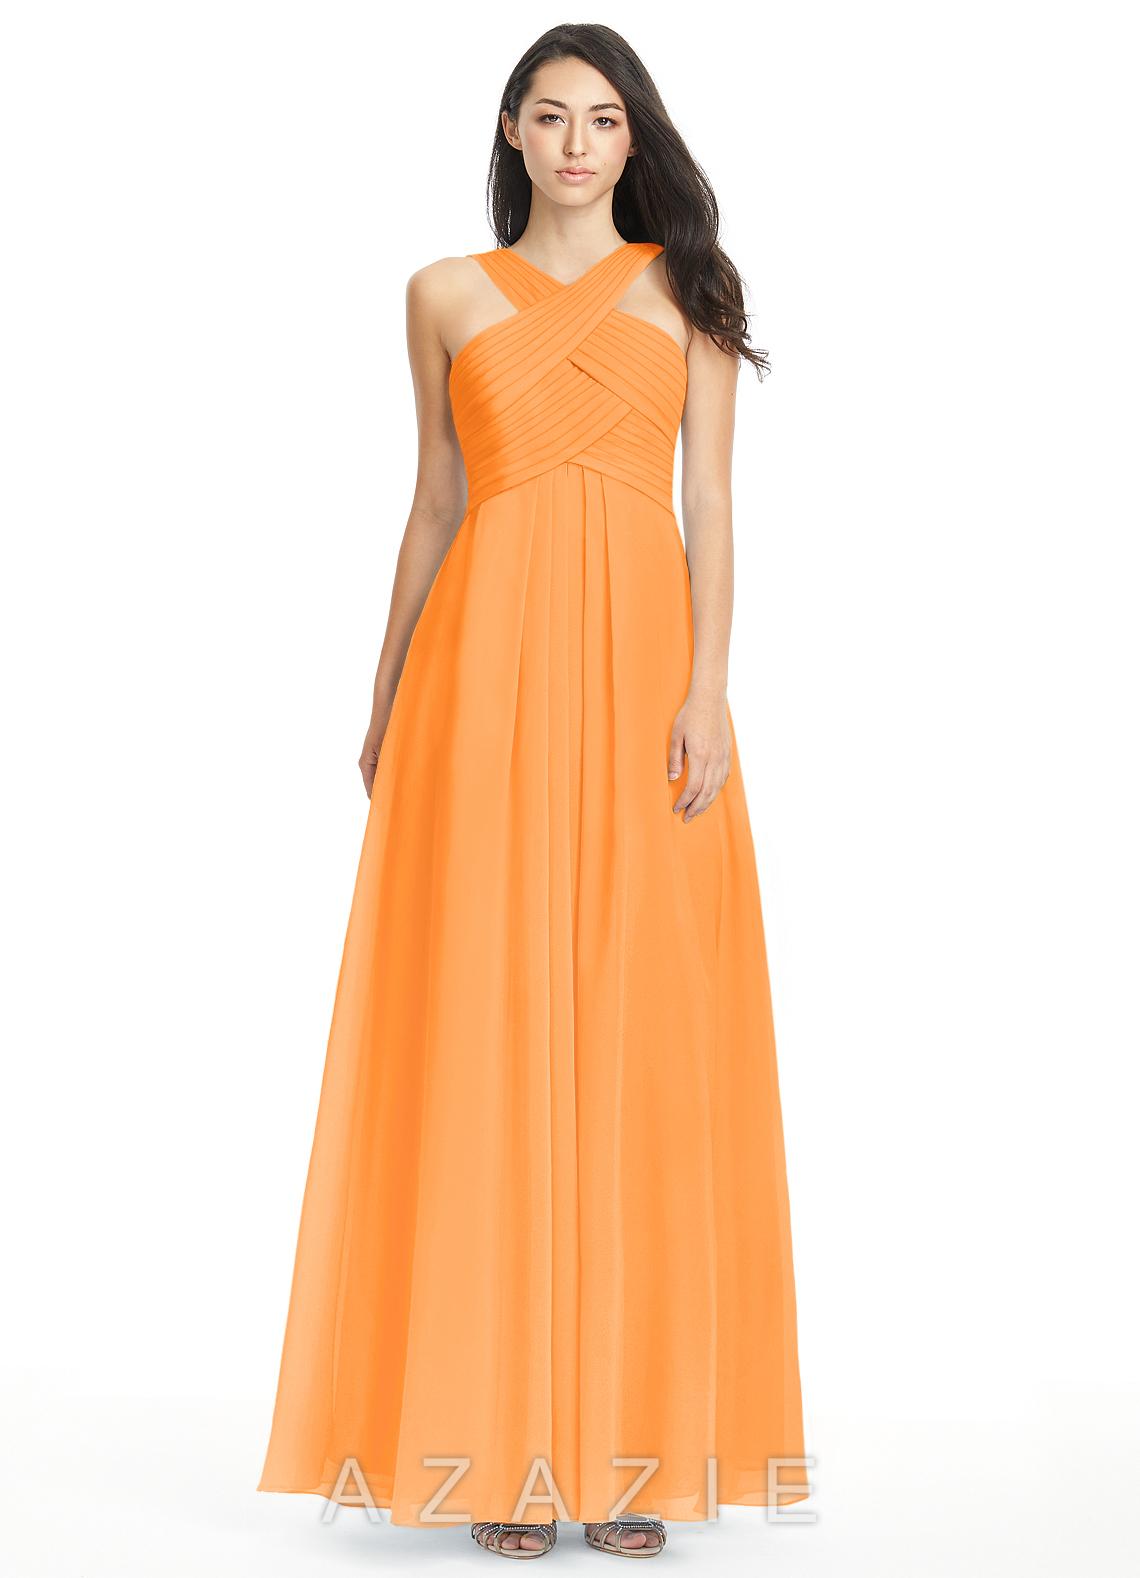 Tangerine bridesmaid dresses tangerine gowns azazie azazie kaleigh azazie kaleigh ombrellifo Images